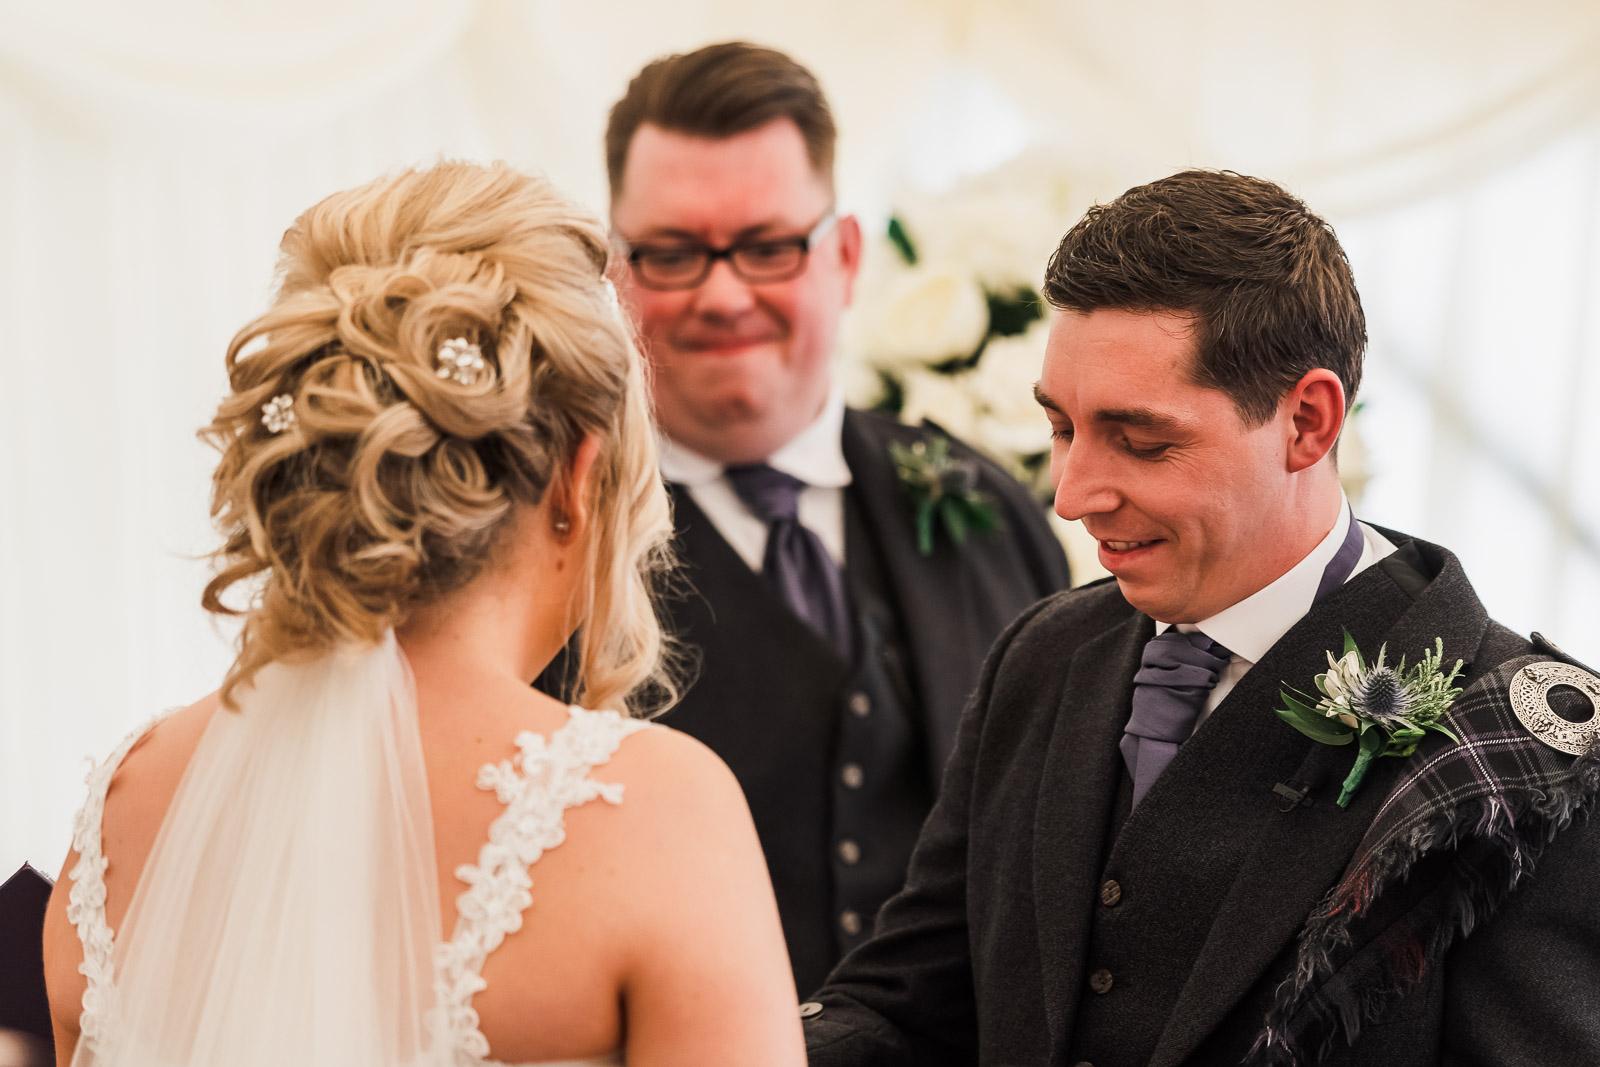 cornhill_castle_wedding_biggar_dearlyphotography (138 of 448).jpg